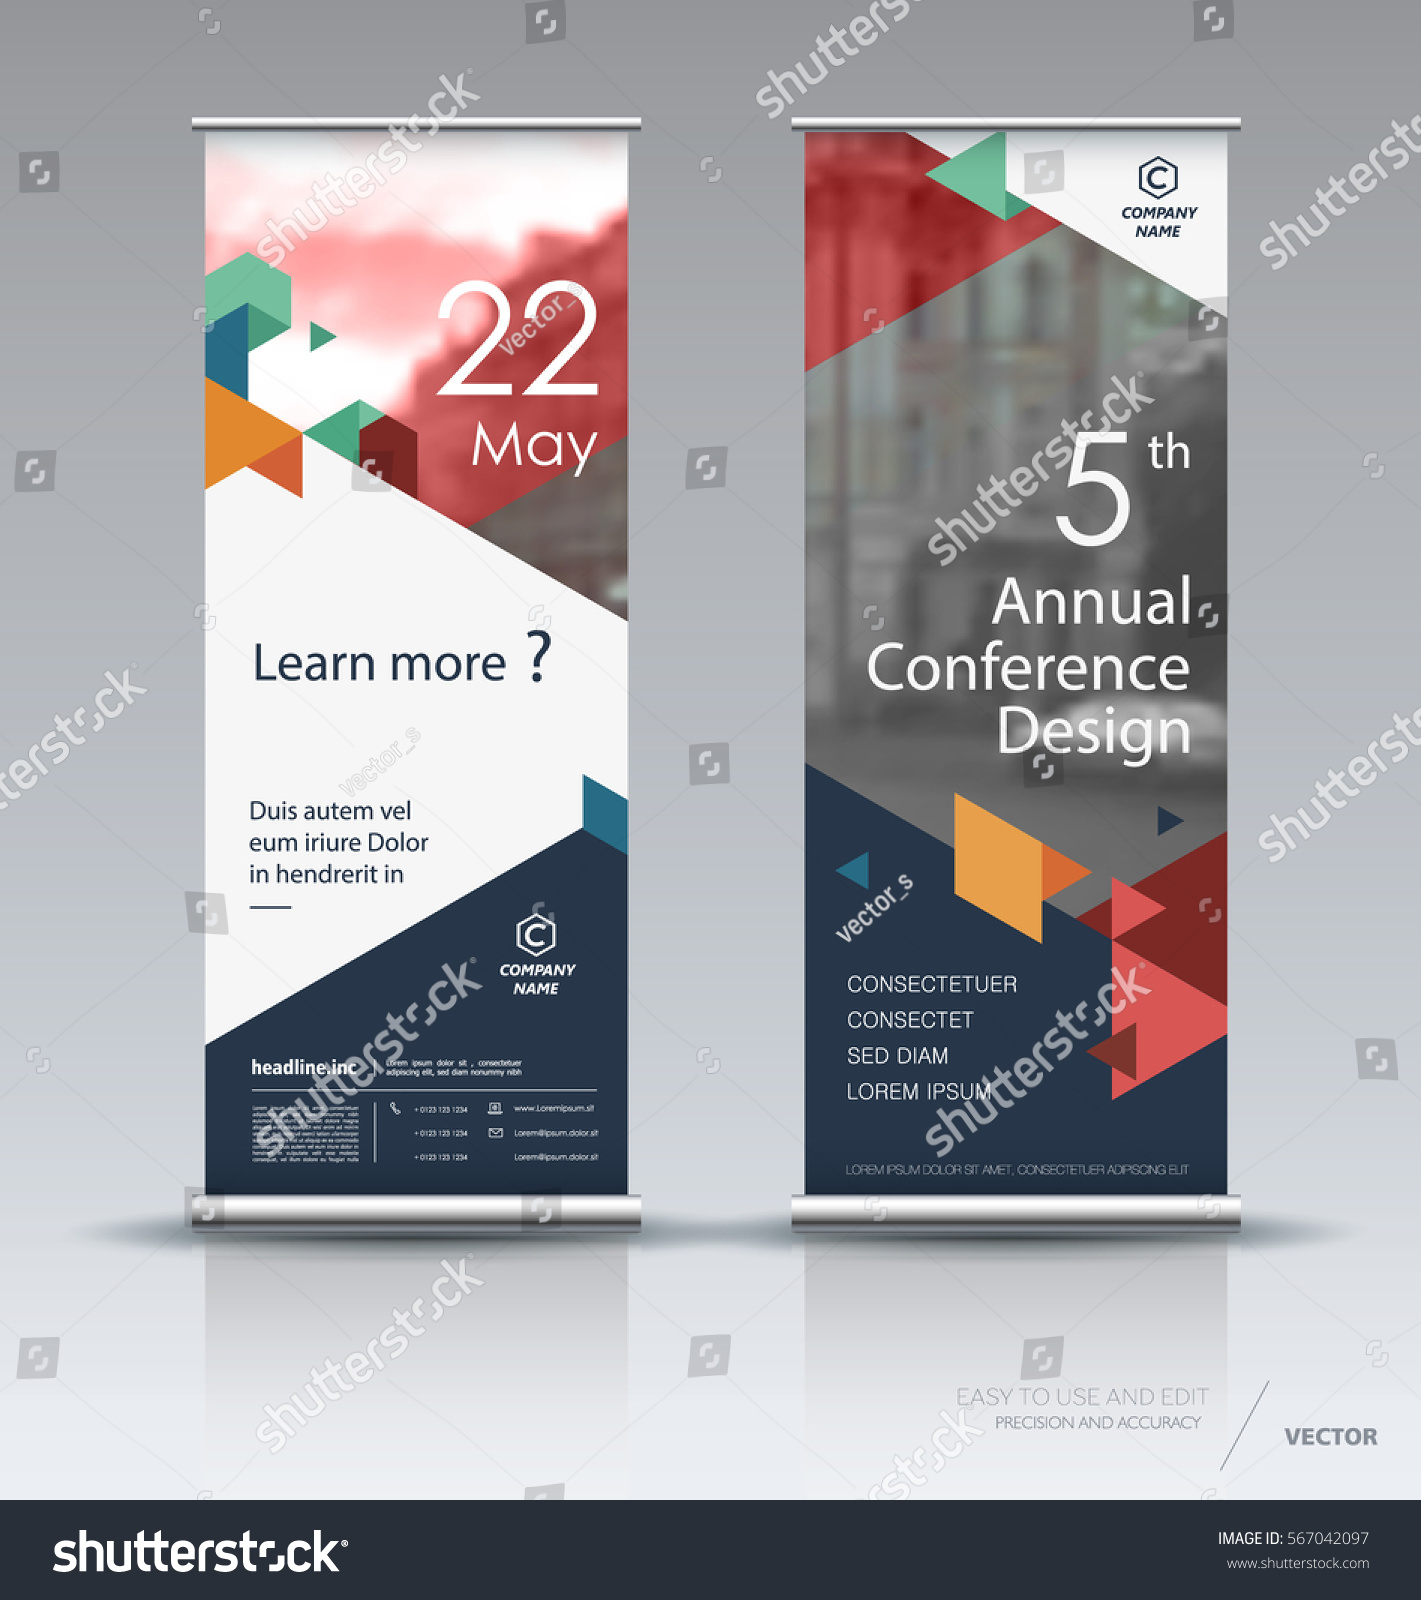 Modern Exhibition Stand Vector : Roll banner design brochure flyer vertical stock vector